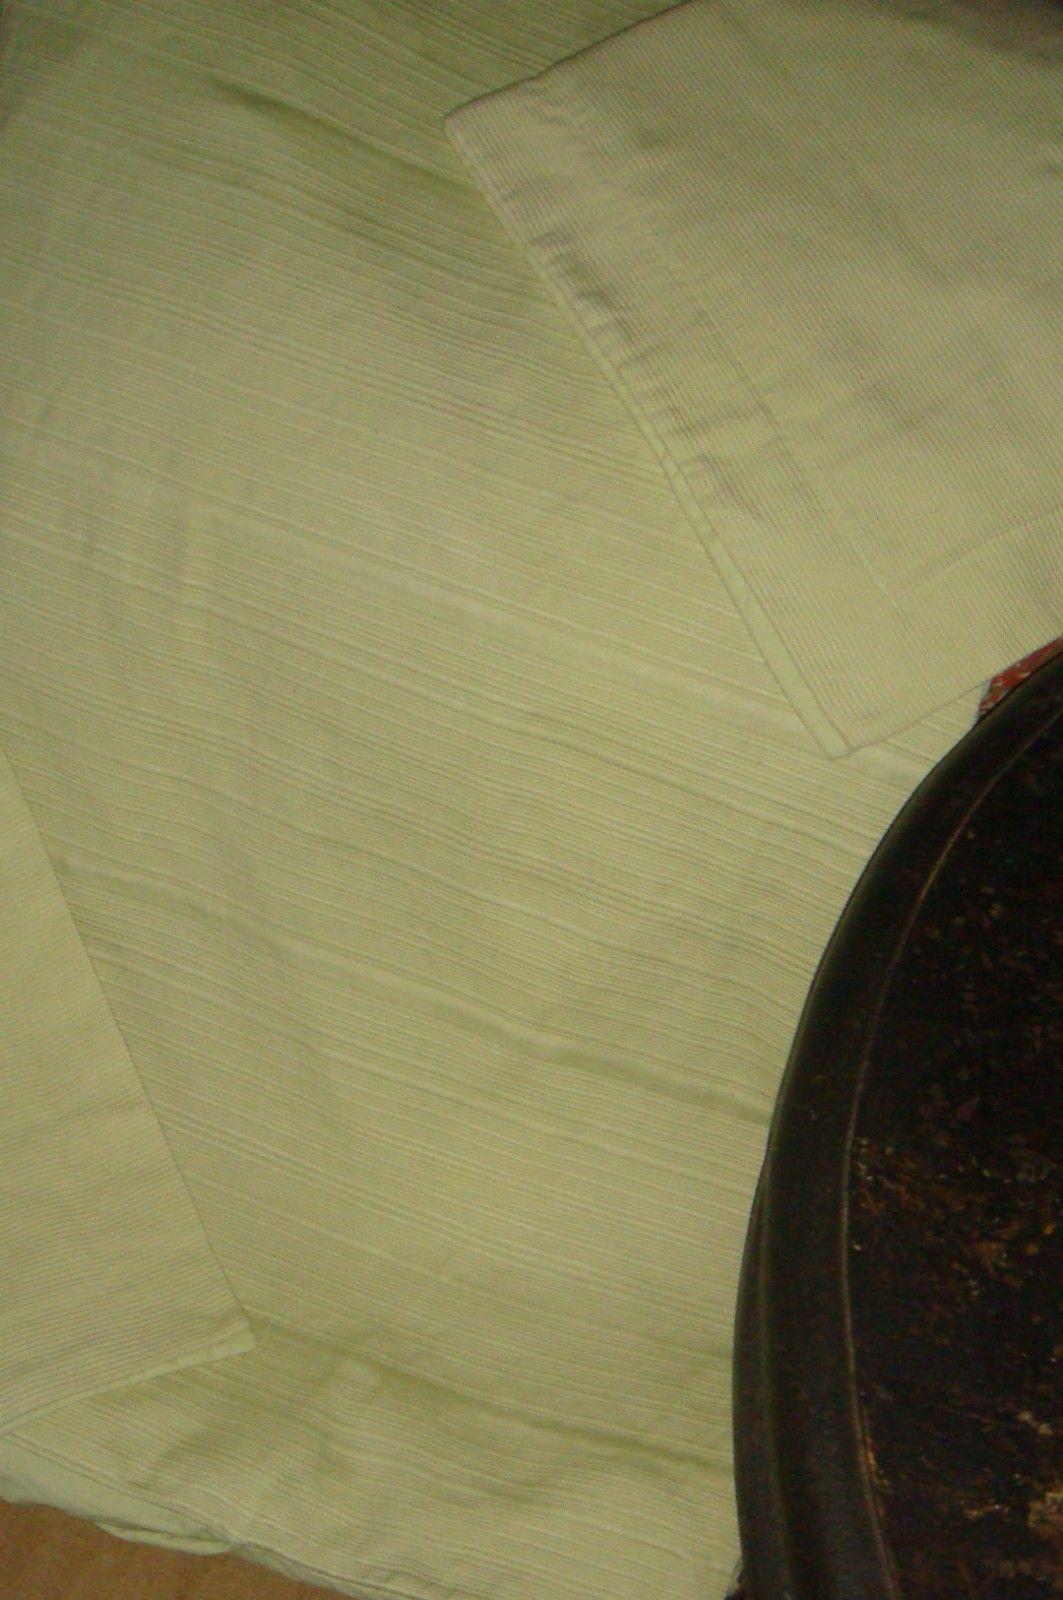 Real Simple Linear Matelasse Ribbed Sage Green Full Queen Duvet Cover & Sham Set